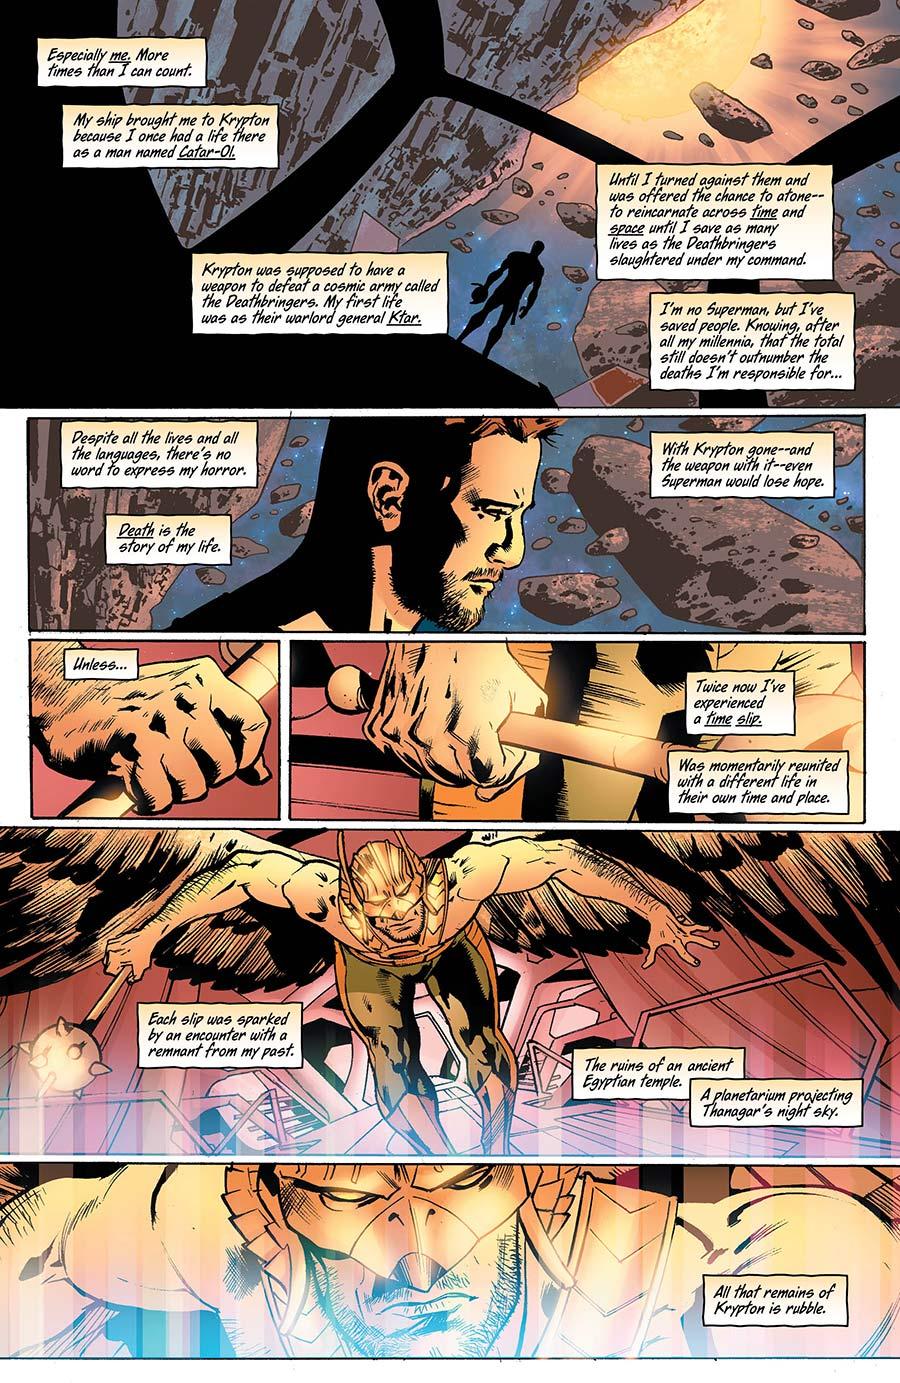 Hawkman_8_2 - DC Comics News